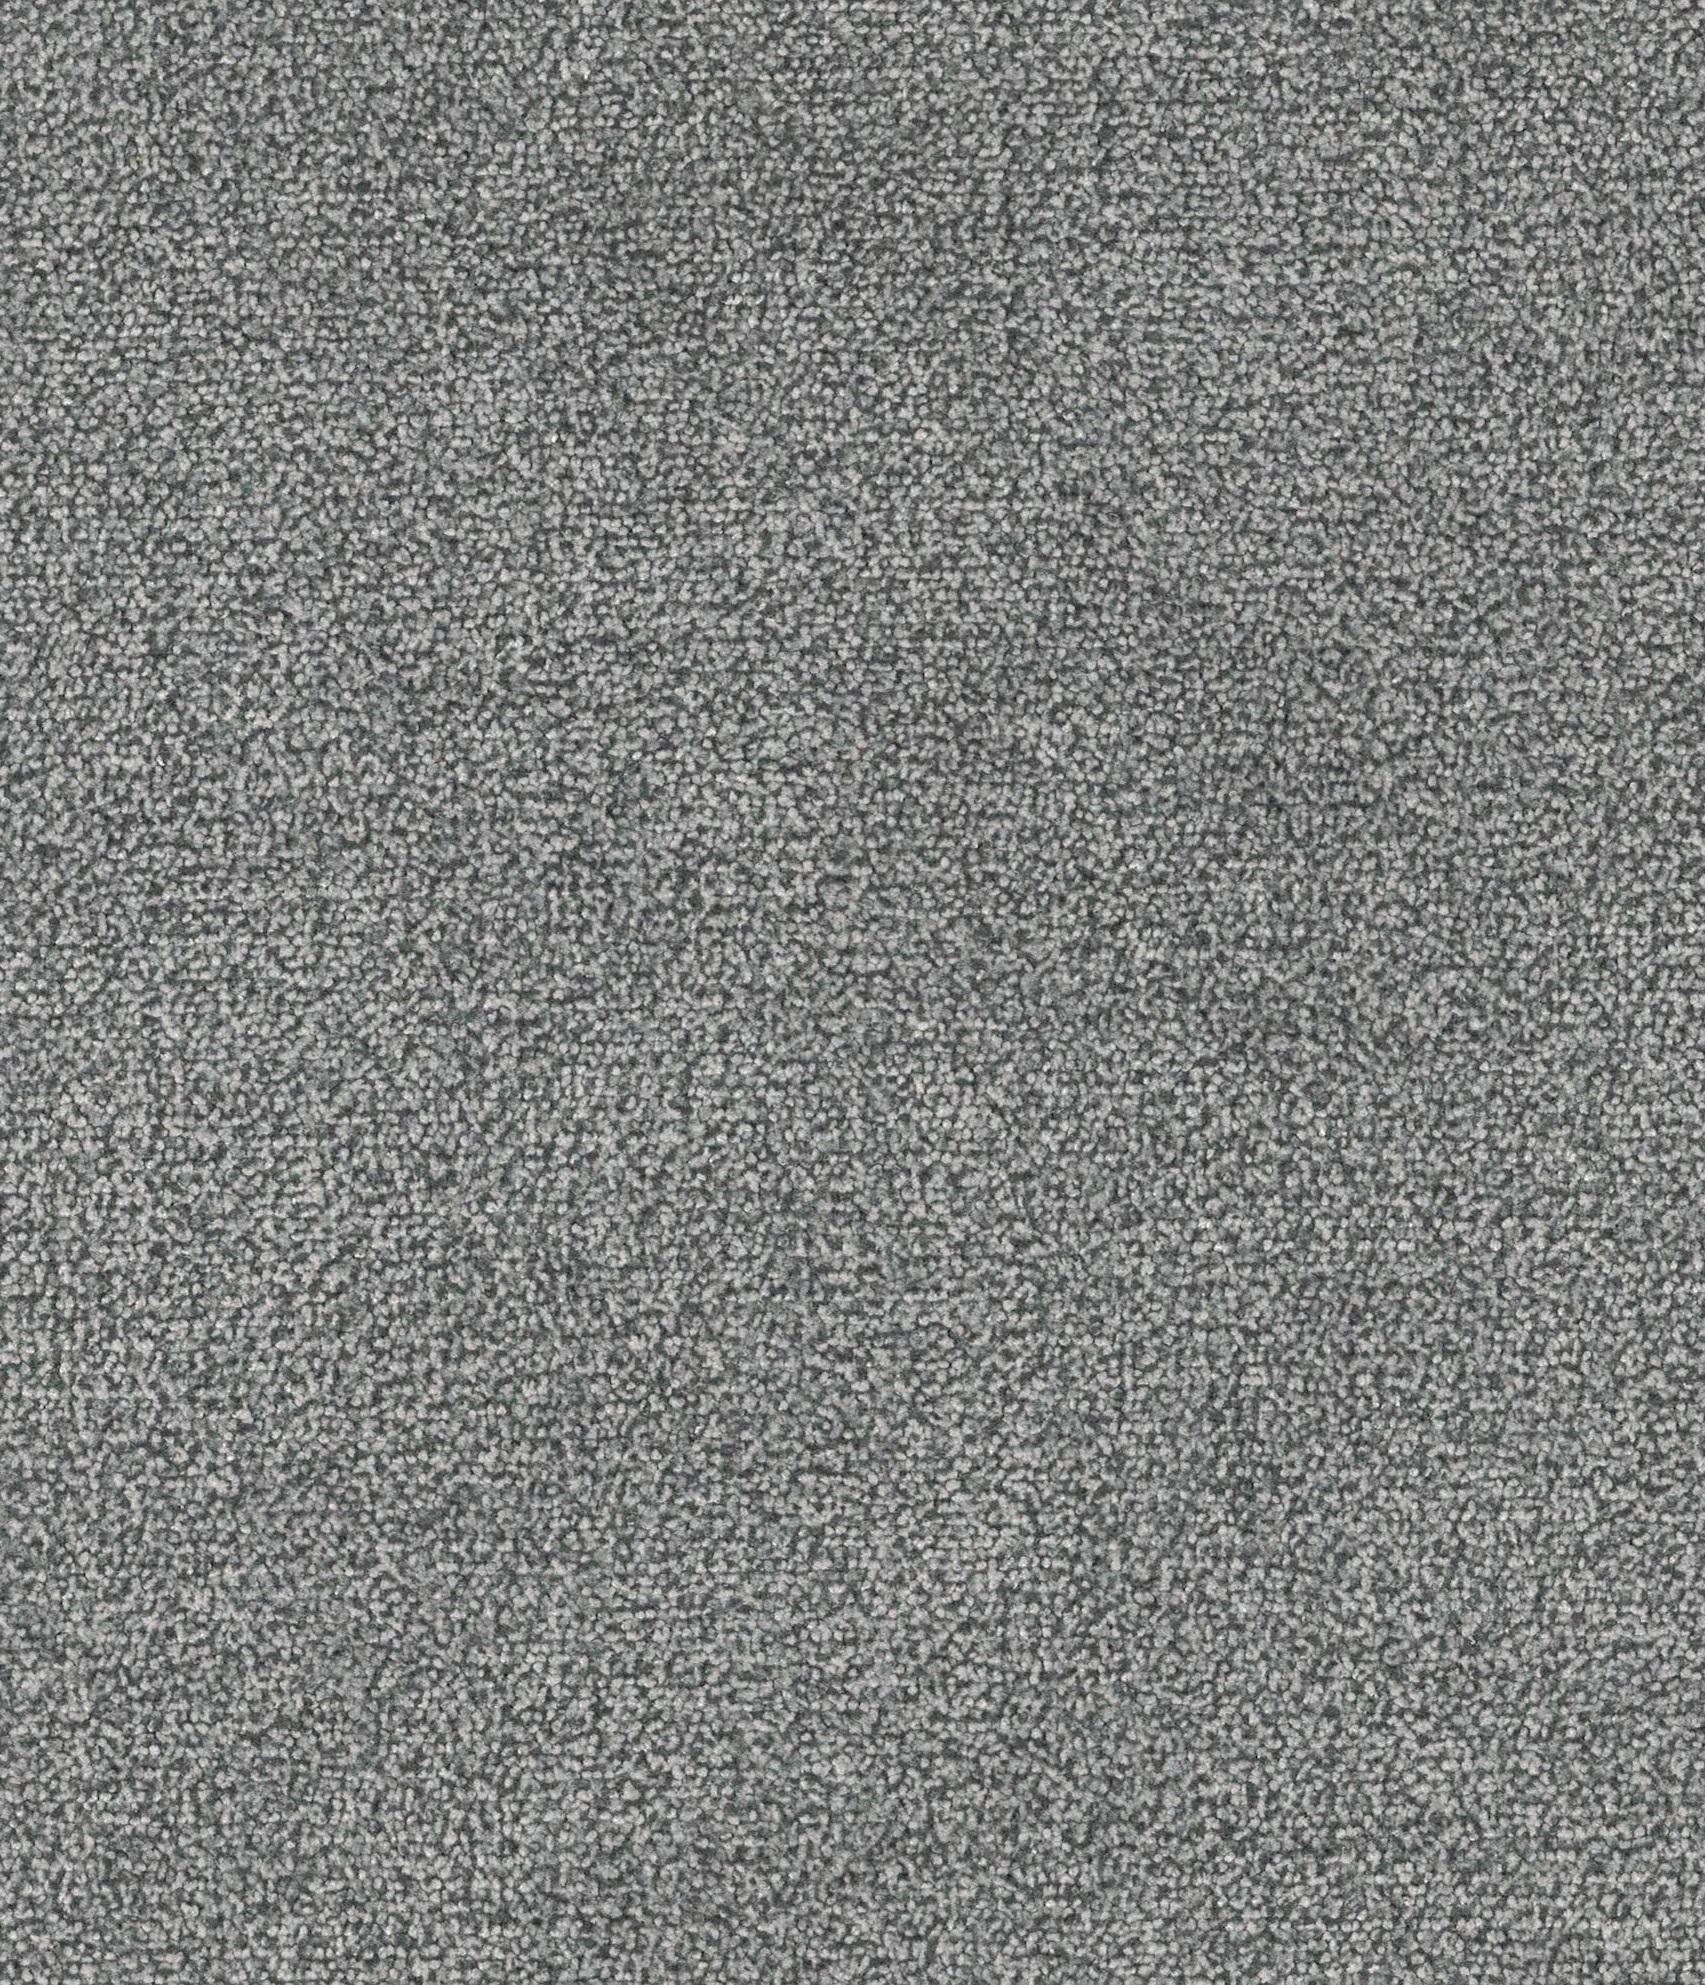 alfa 18 grey